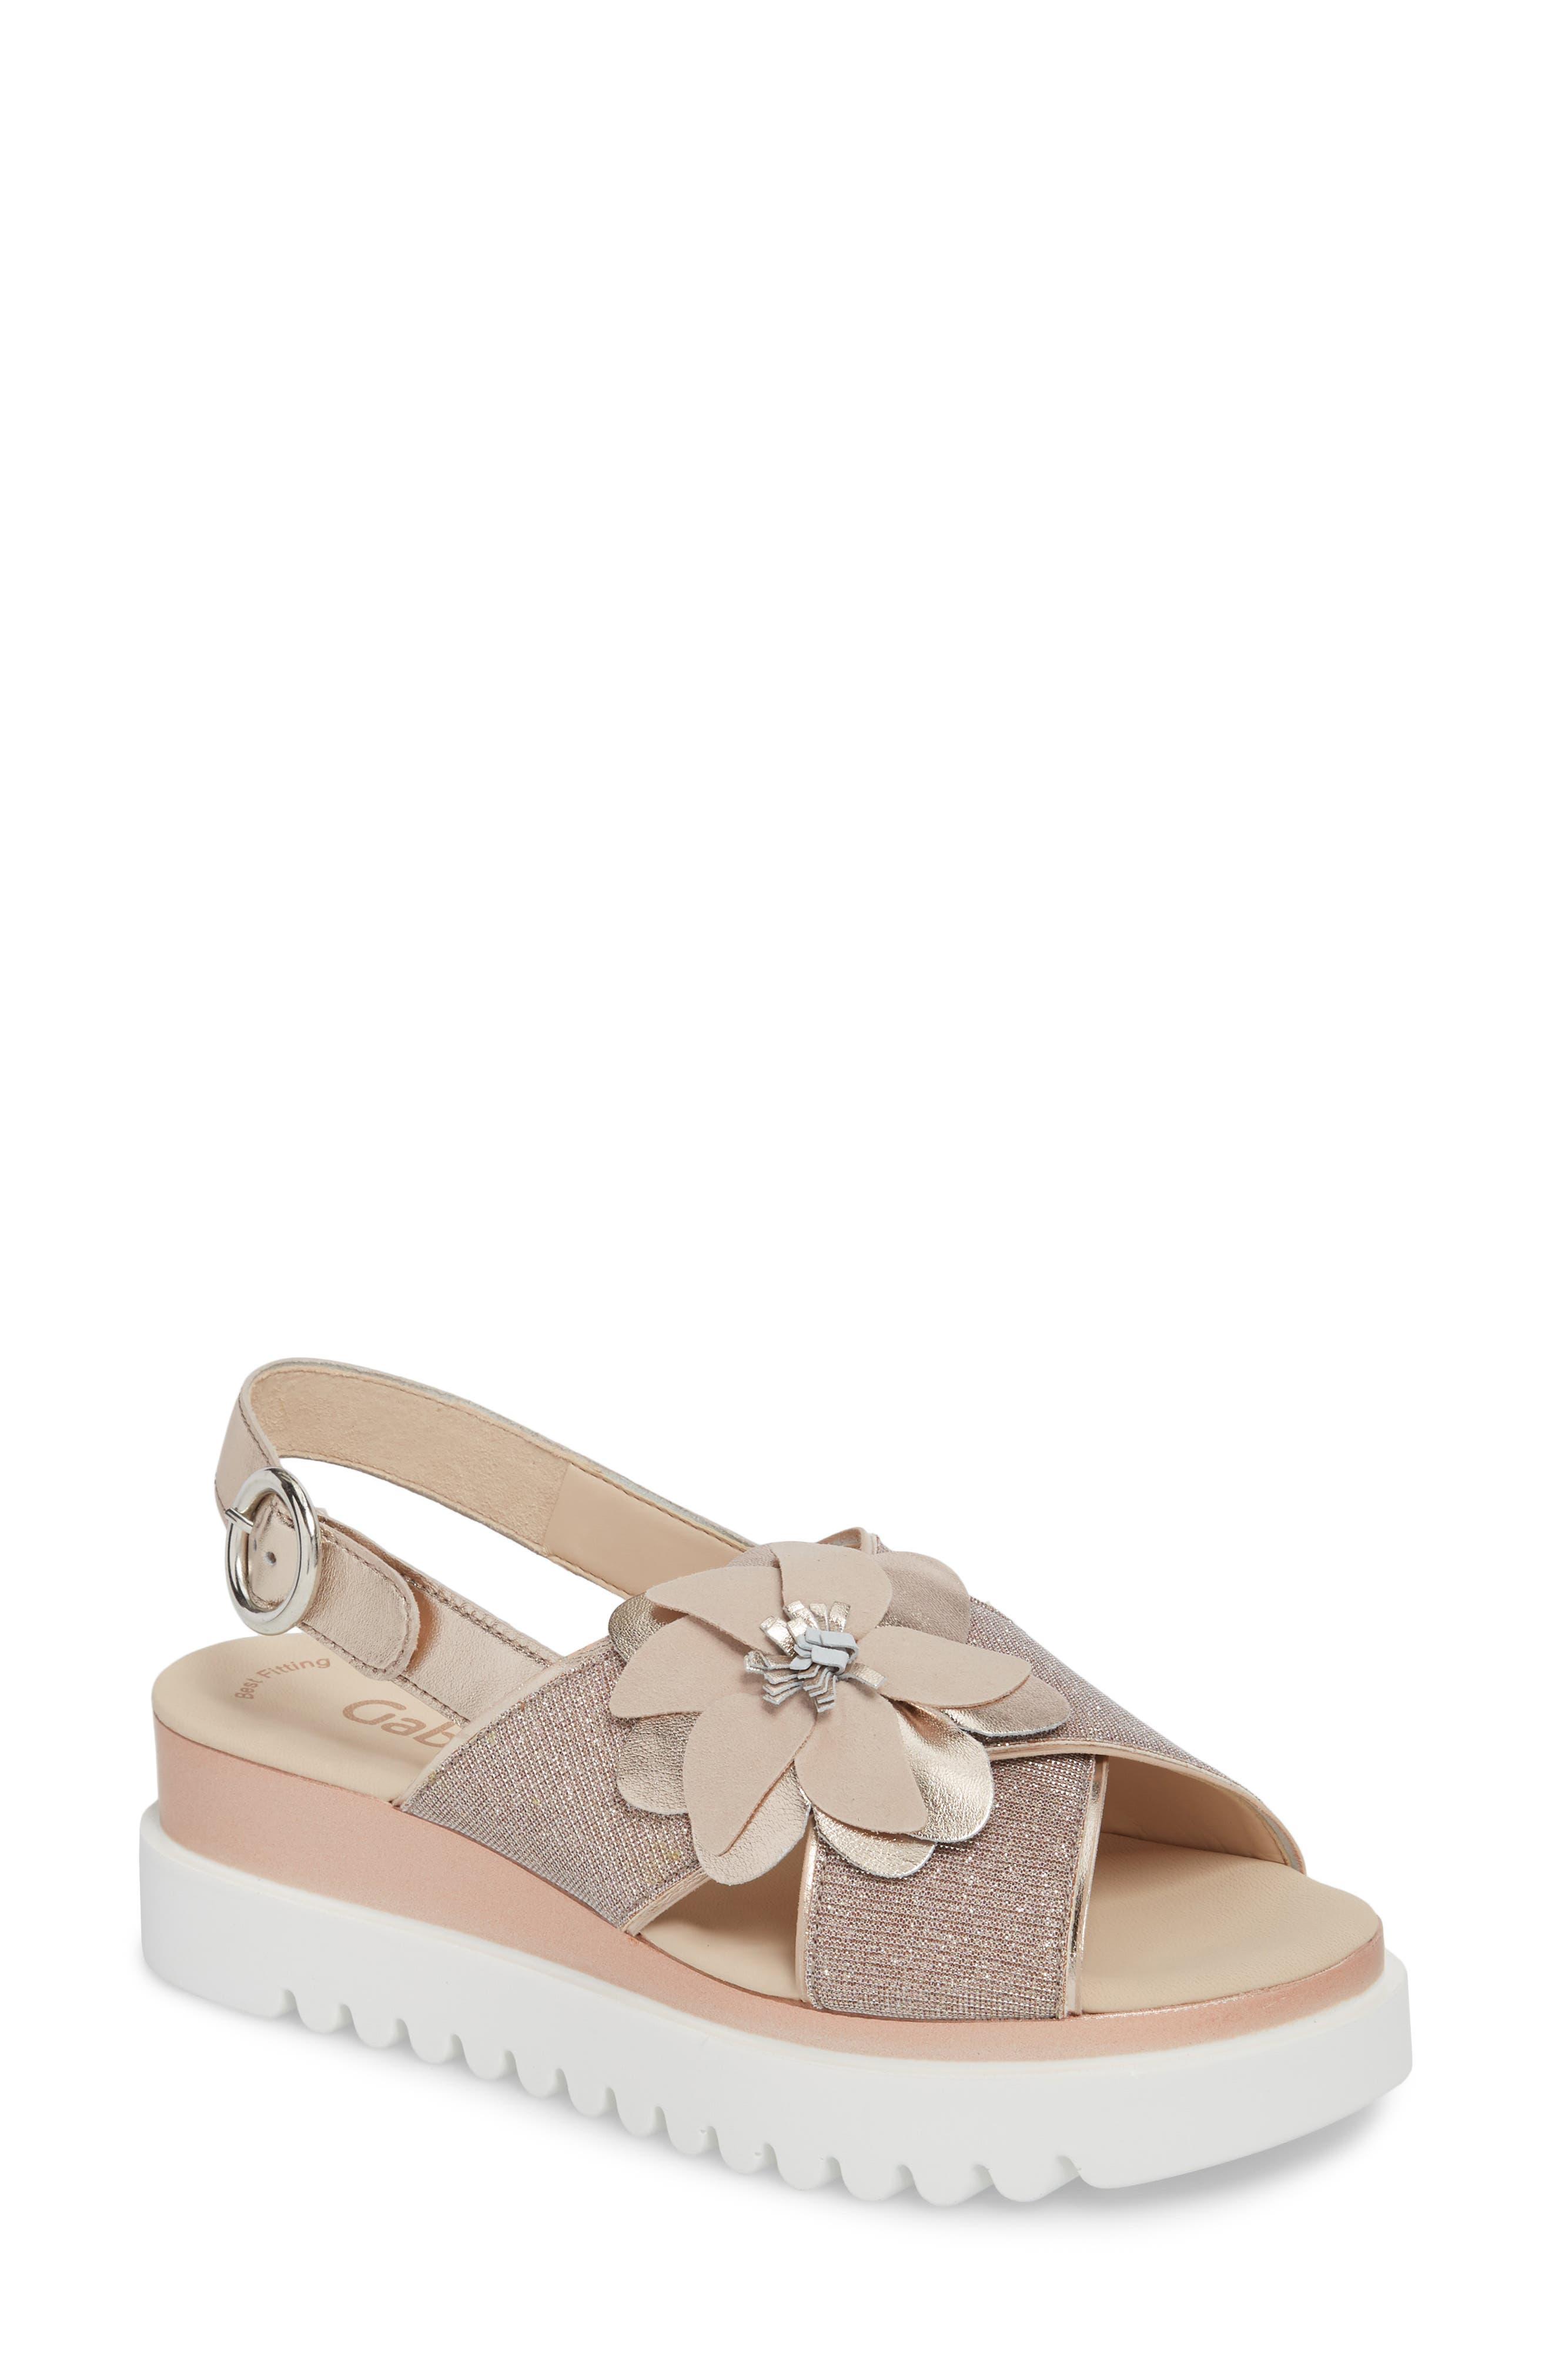 Flower Platform Sandal,                         Main,                         color, Rose Metallic Fabric